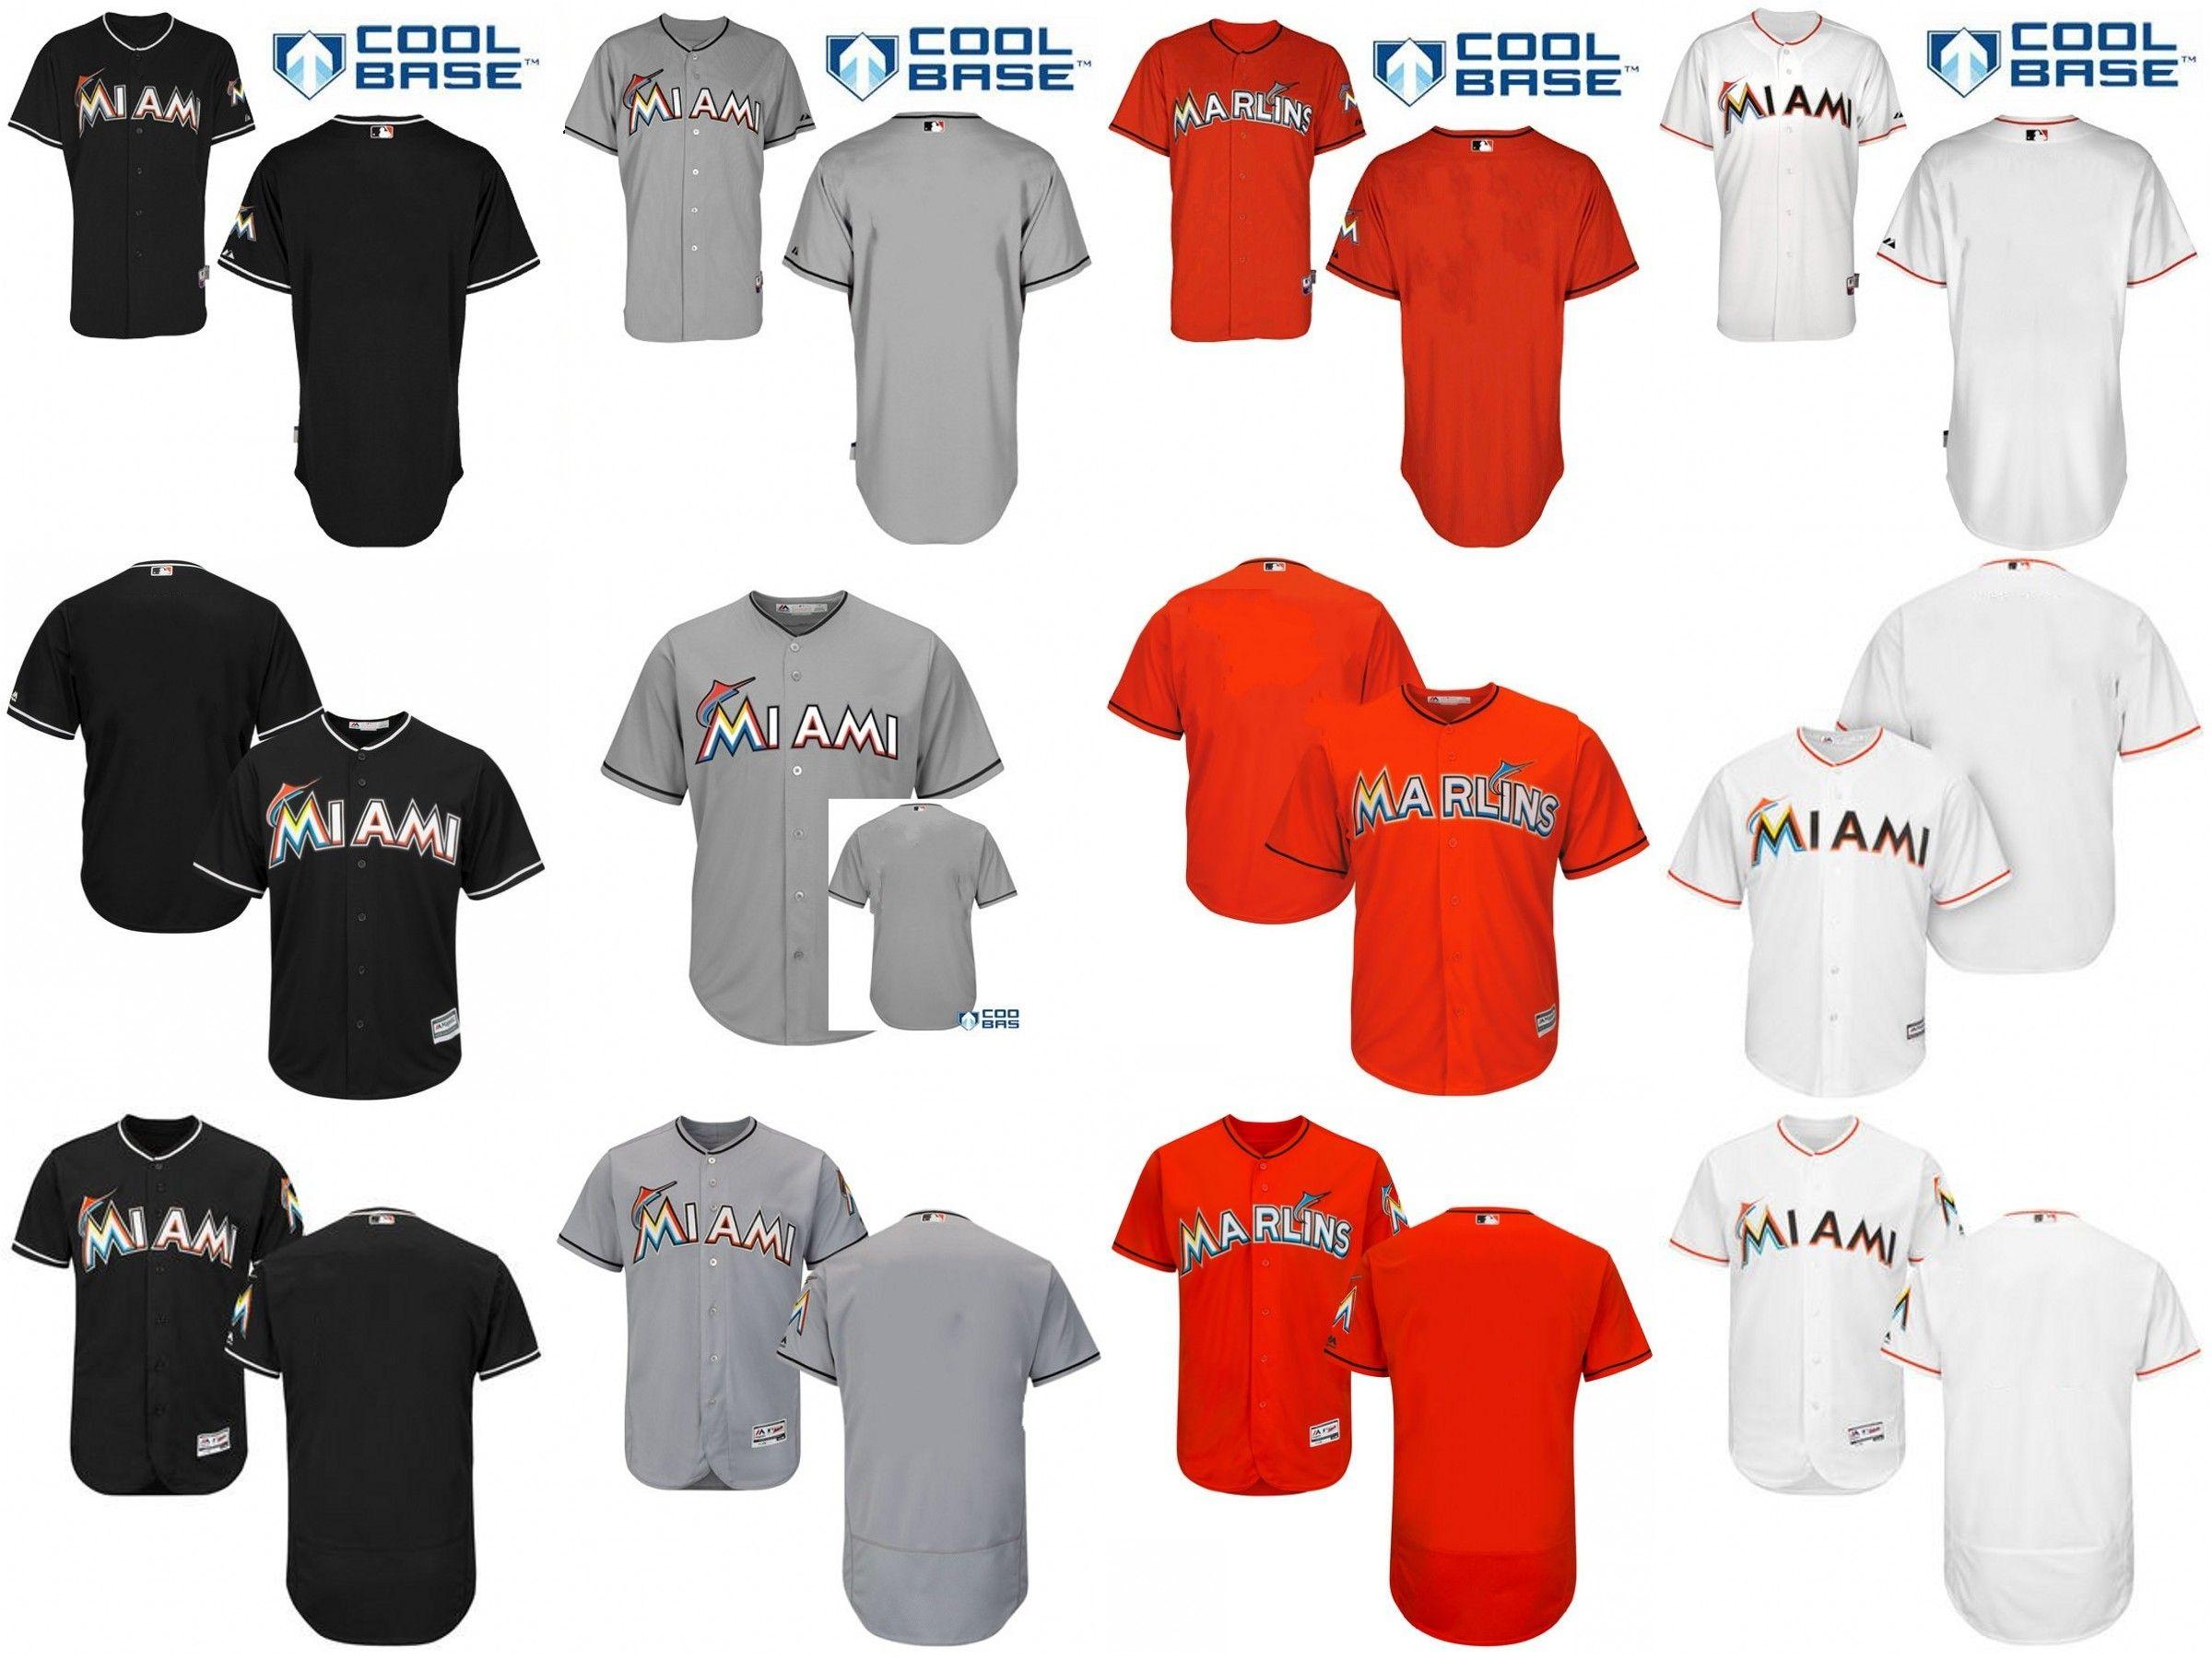 905dd158334 ... 2017 MenS Custom Florida Marlins Black Gray Orange White Cool Base And  Flexbase Blank Jerseys Stitched ...